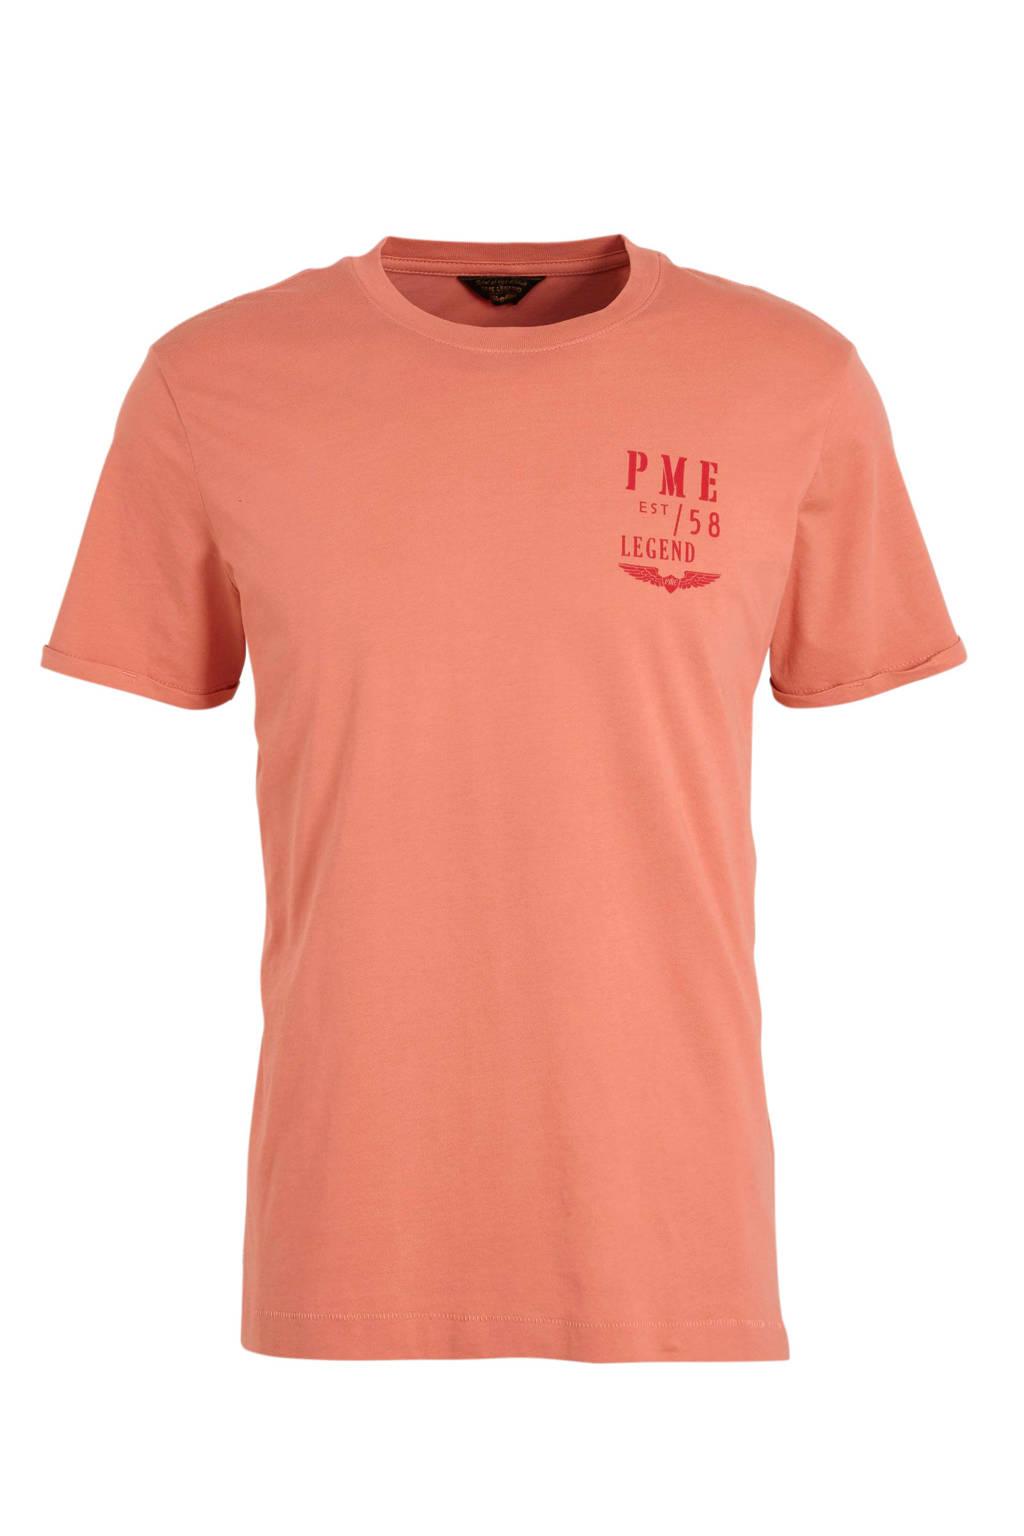 PME Legend T-shirt met logo roze, Roze